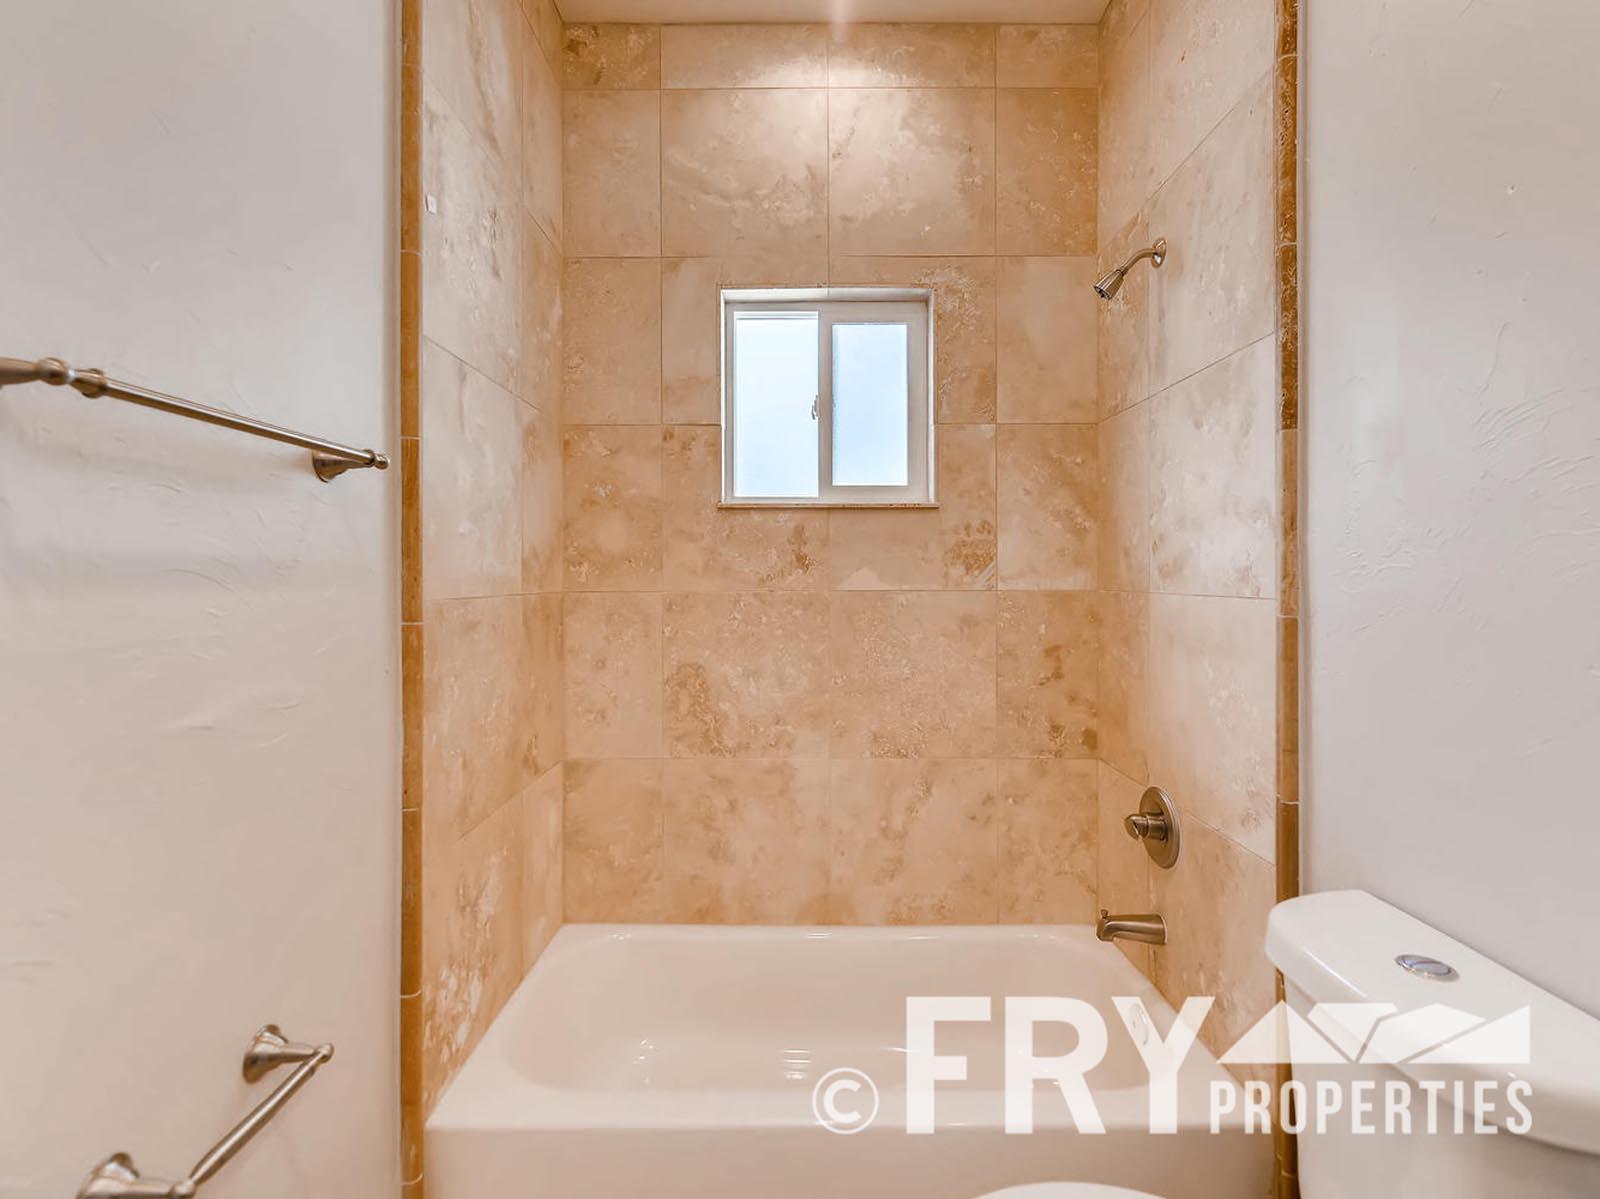 2808 S Delaware Street-large-022-11-Bathroom-1499x1000-72dpi